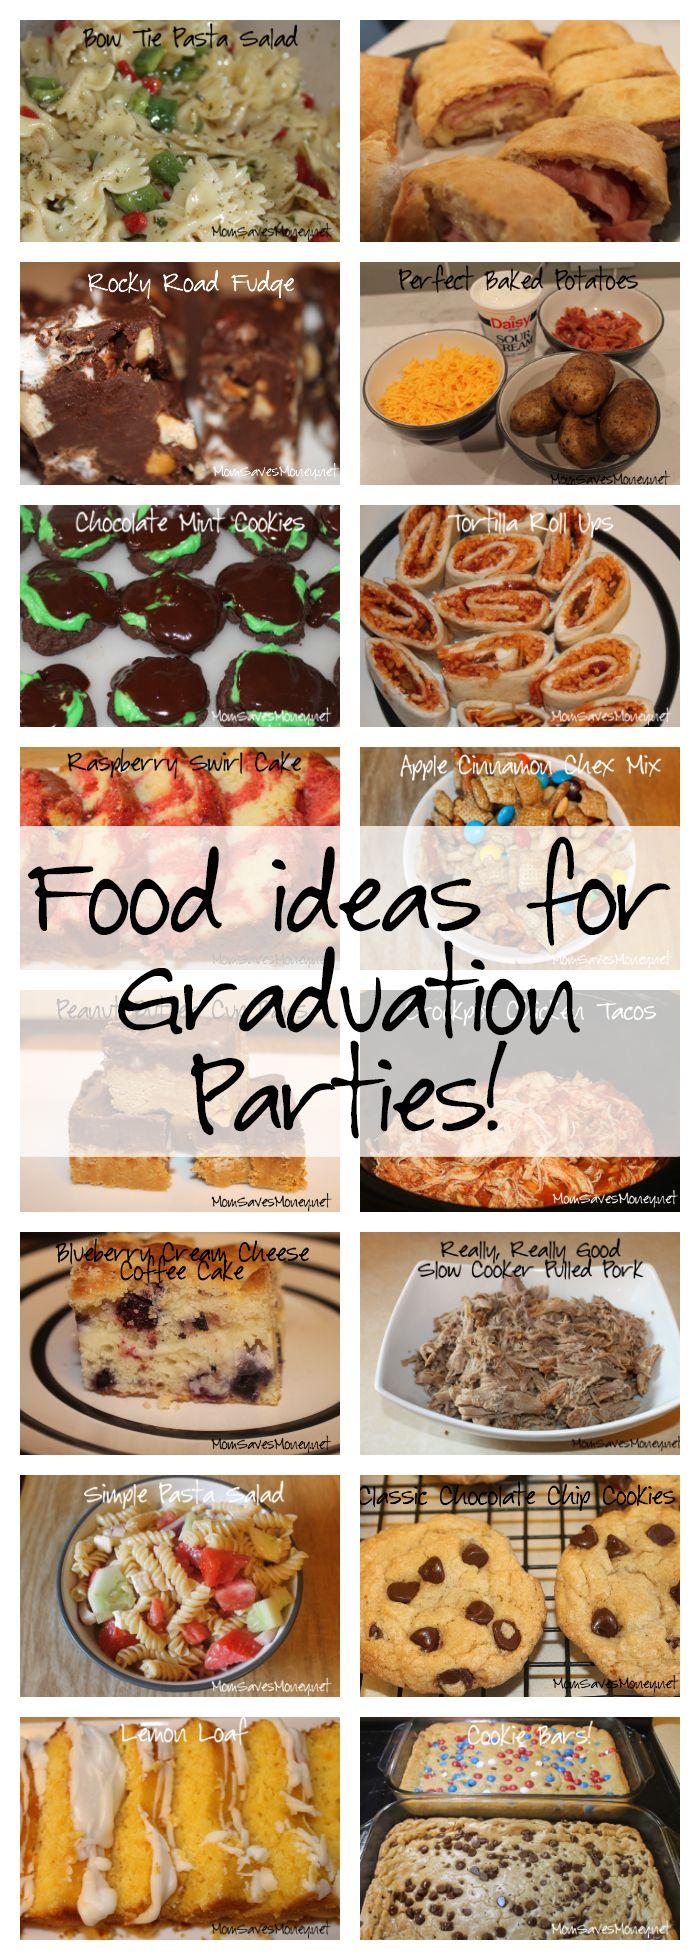 Menu Ideas for Graduation Parties! – Mom Saves Money